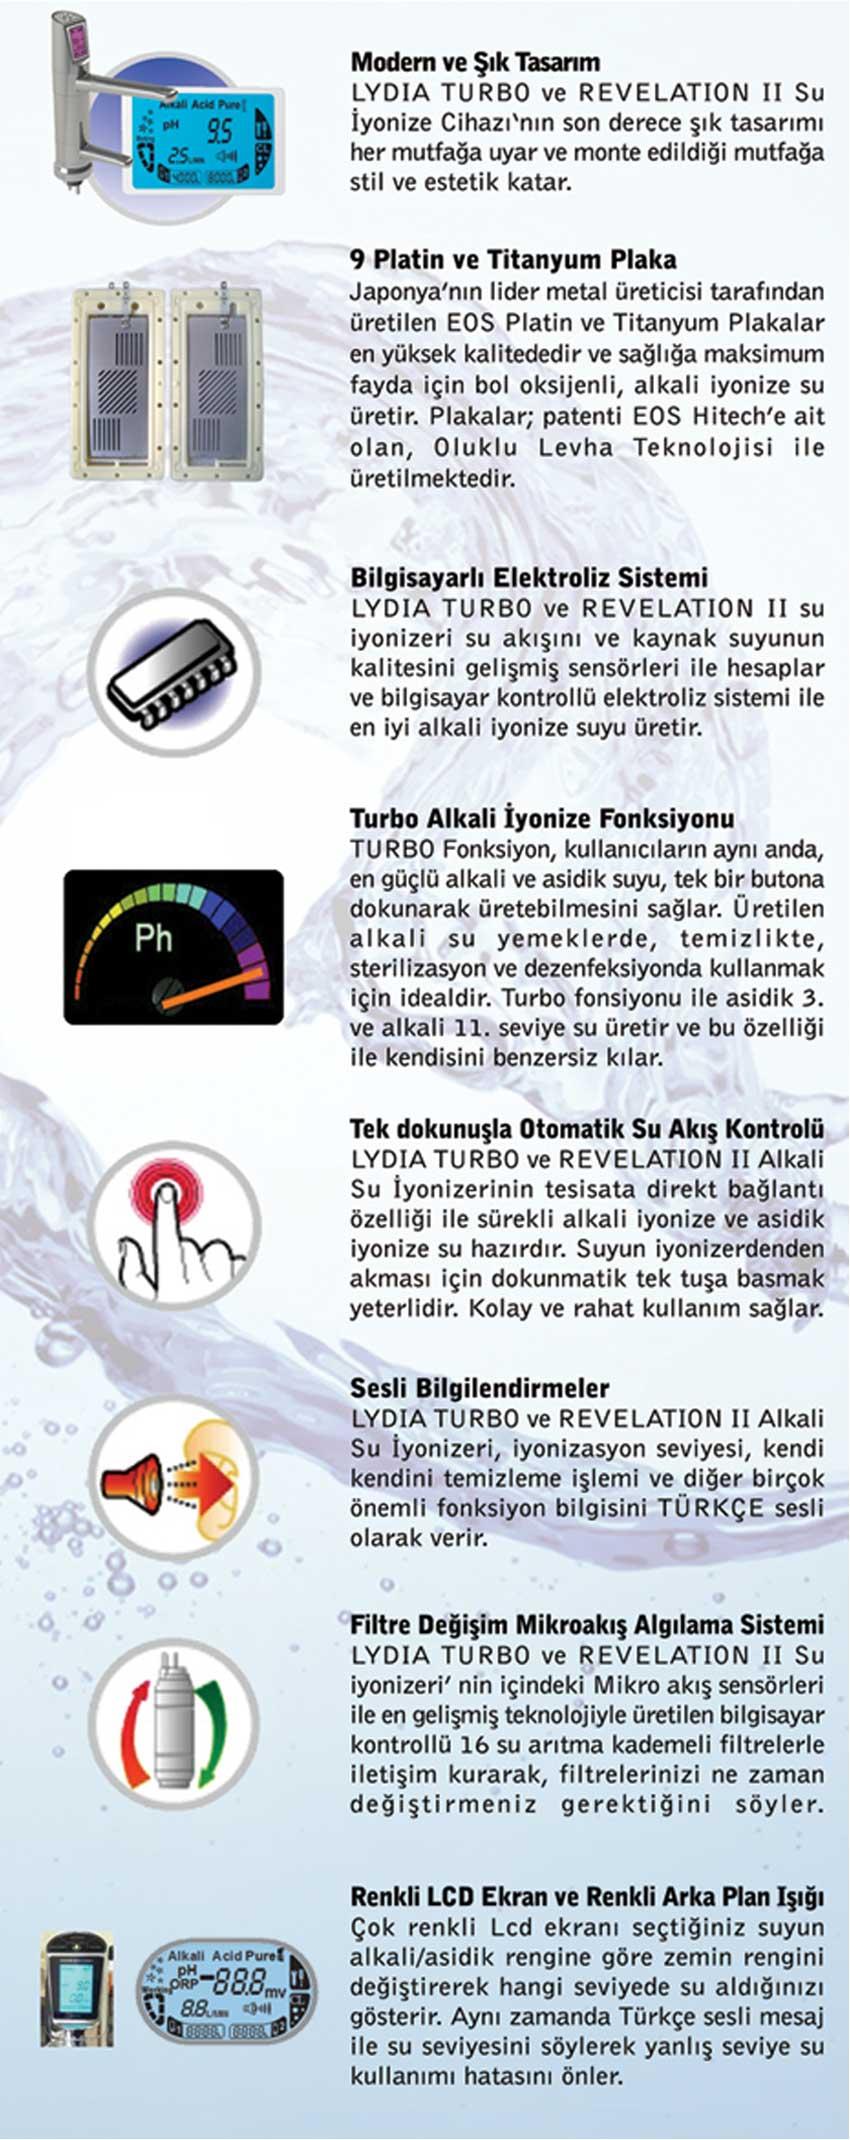 ALKALİ SU İYONİZERİ REVELATION II - OZELLIKLERI